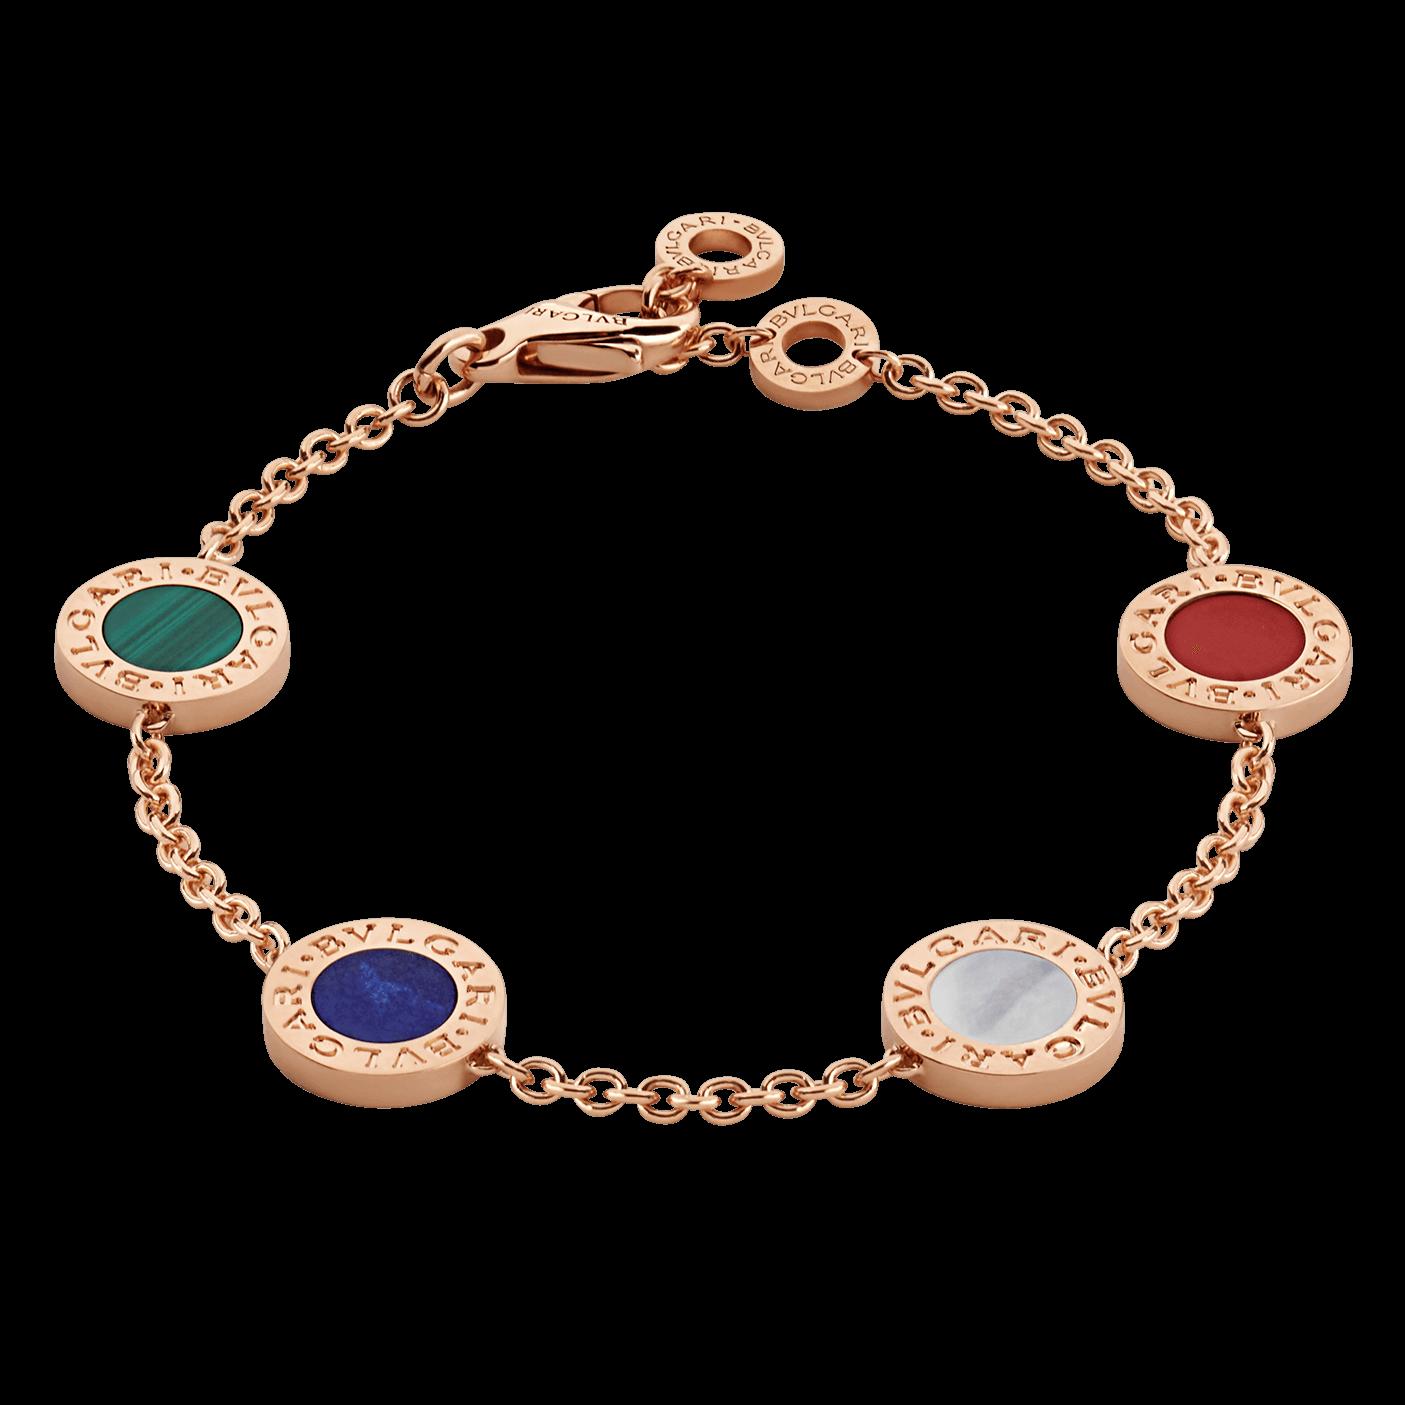 Fake Bulgari Bracelet 18k rose gold